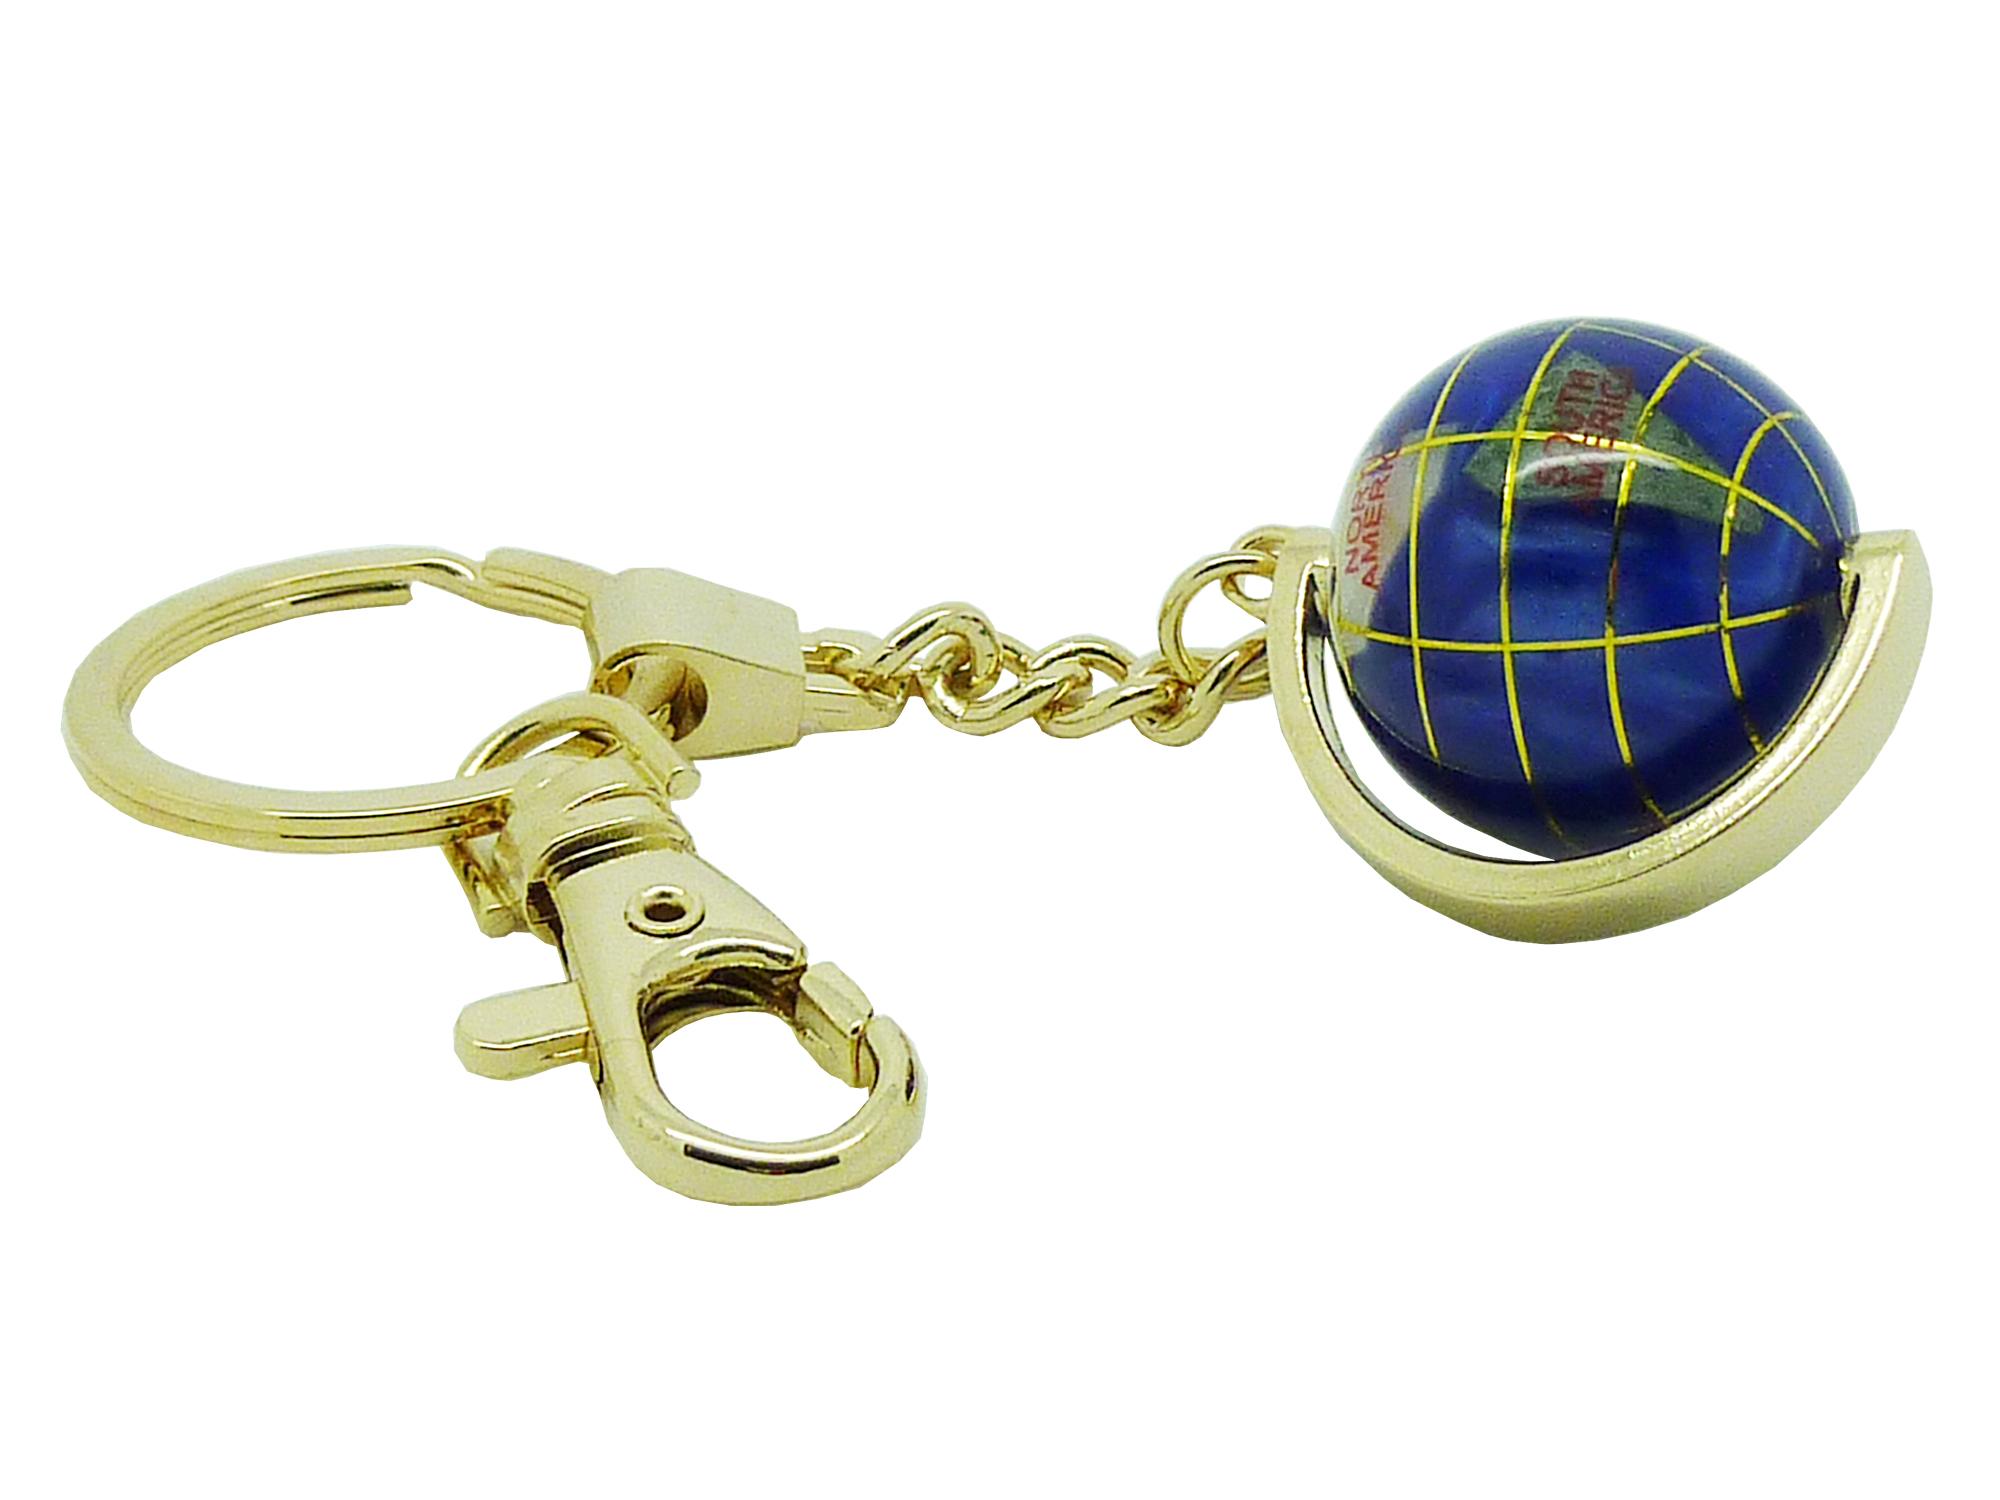 Globe terrestre porte clés doré en pierres fines bleu navy